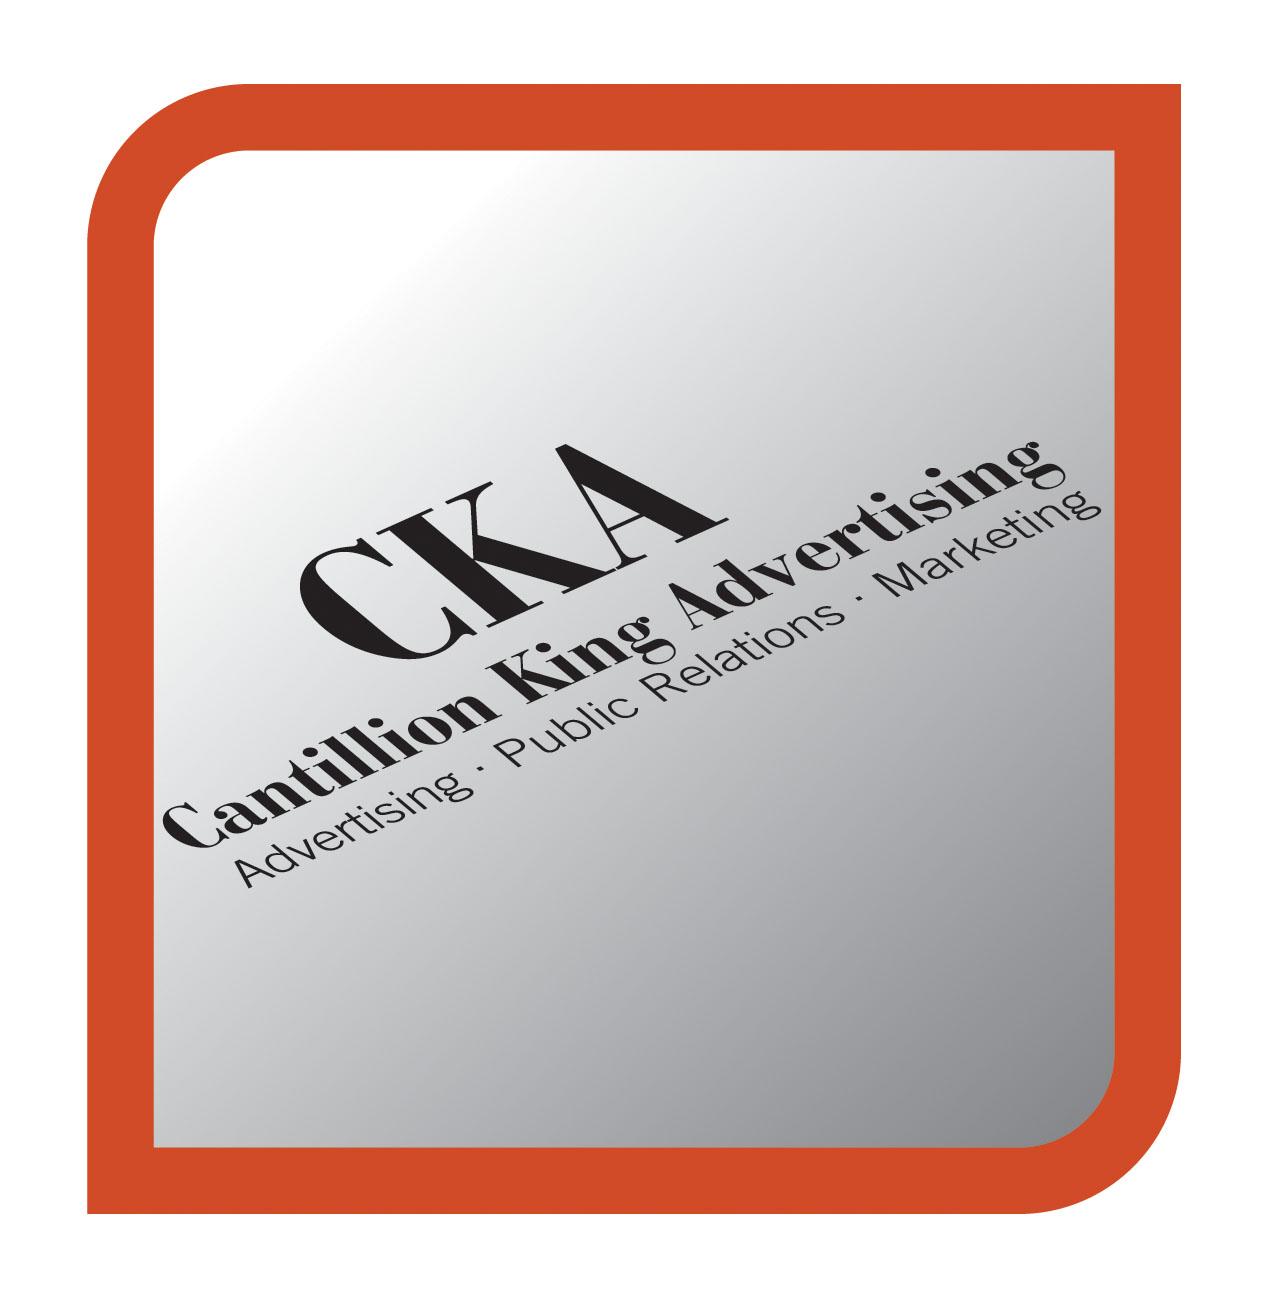 Cantillion King Advertising